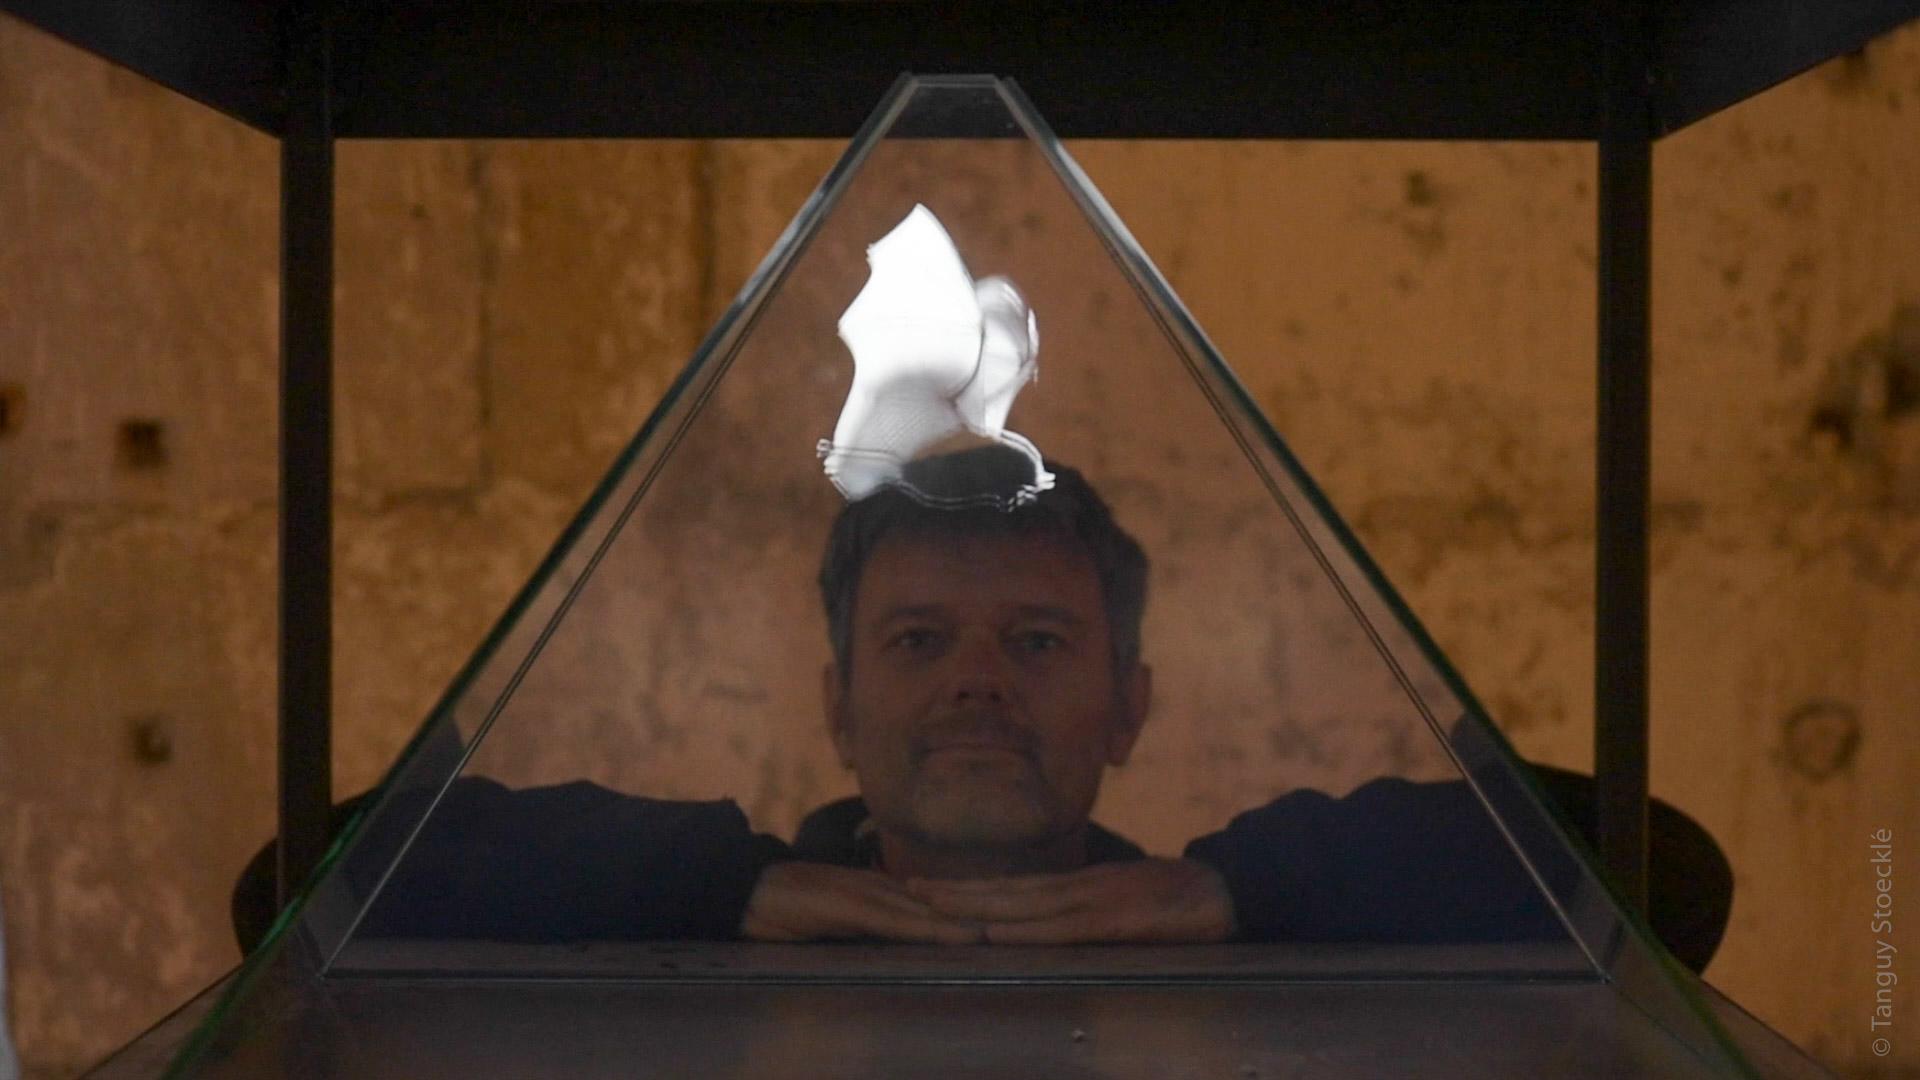 Rhinologramme_Autoportrait-TanguyStoecklé-devant-son-Petit-Rhinolophe-filmé-en-ultra-ralenti_Hologramme